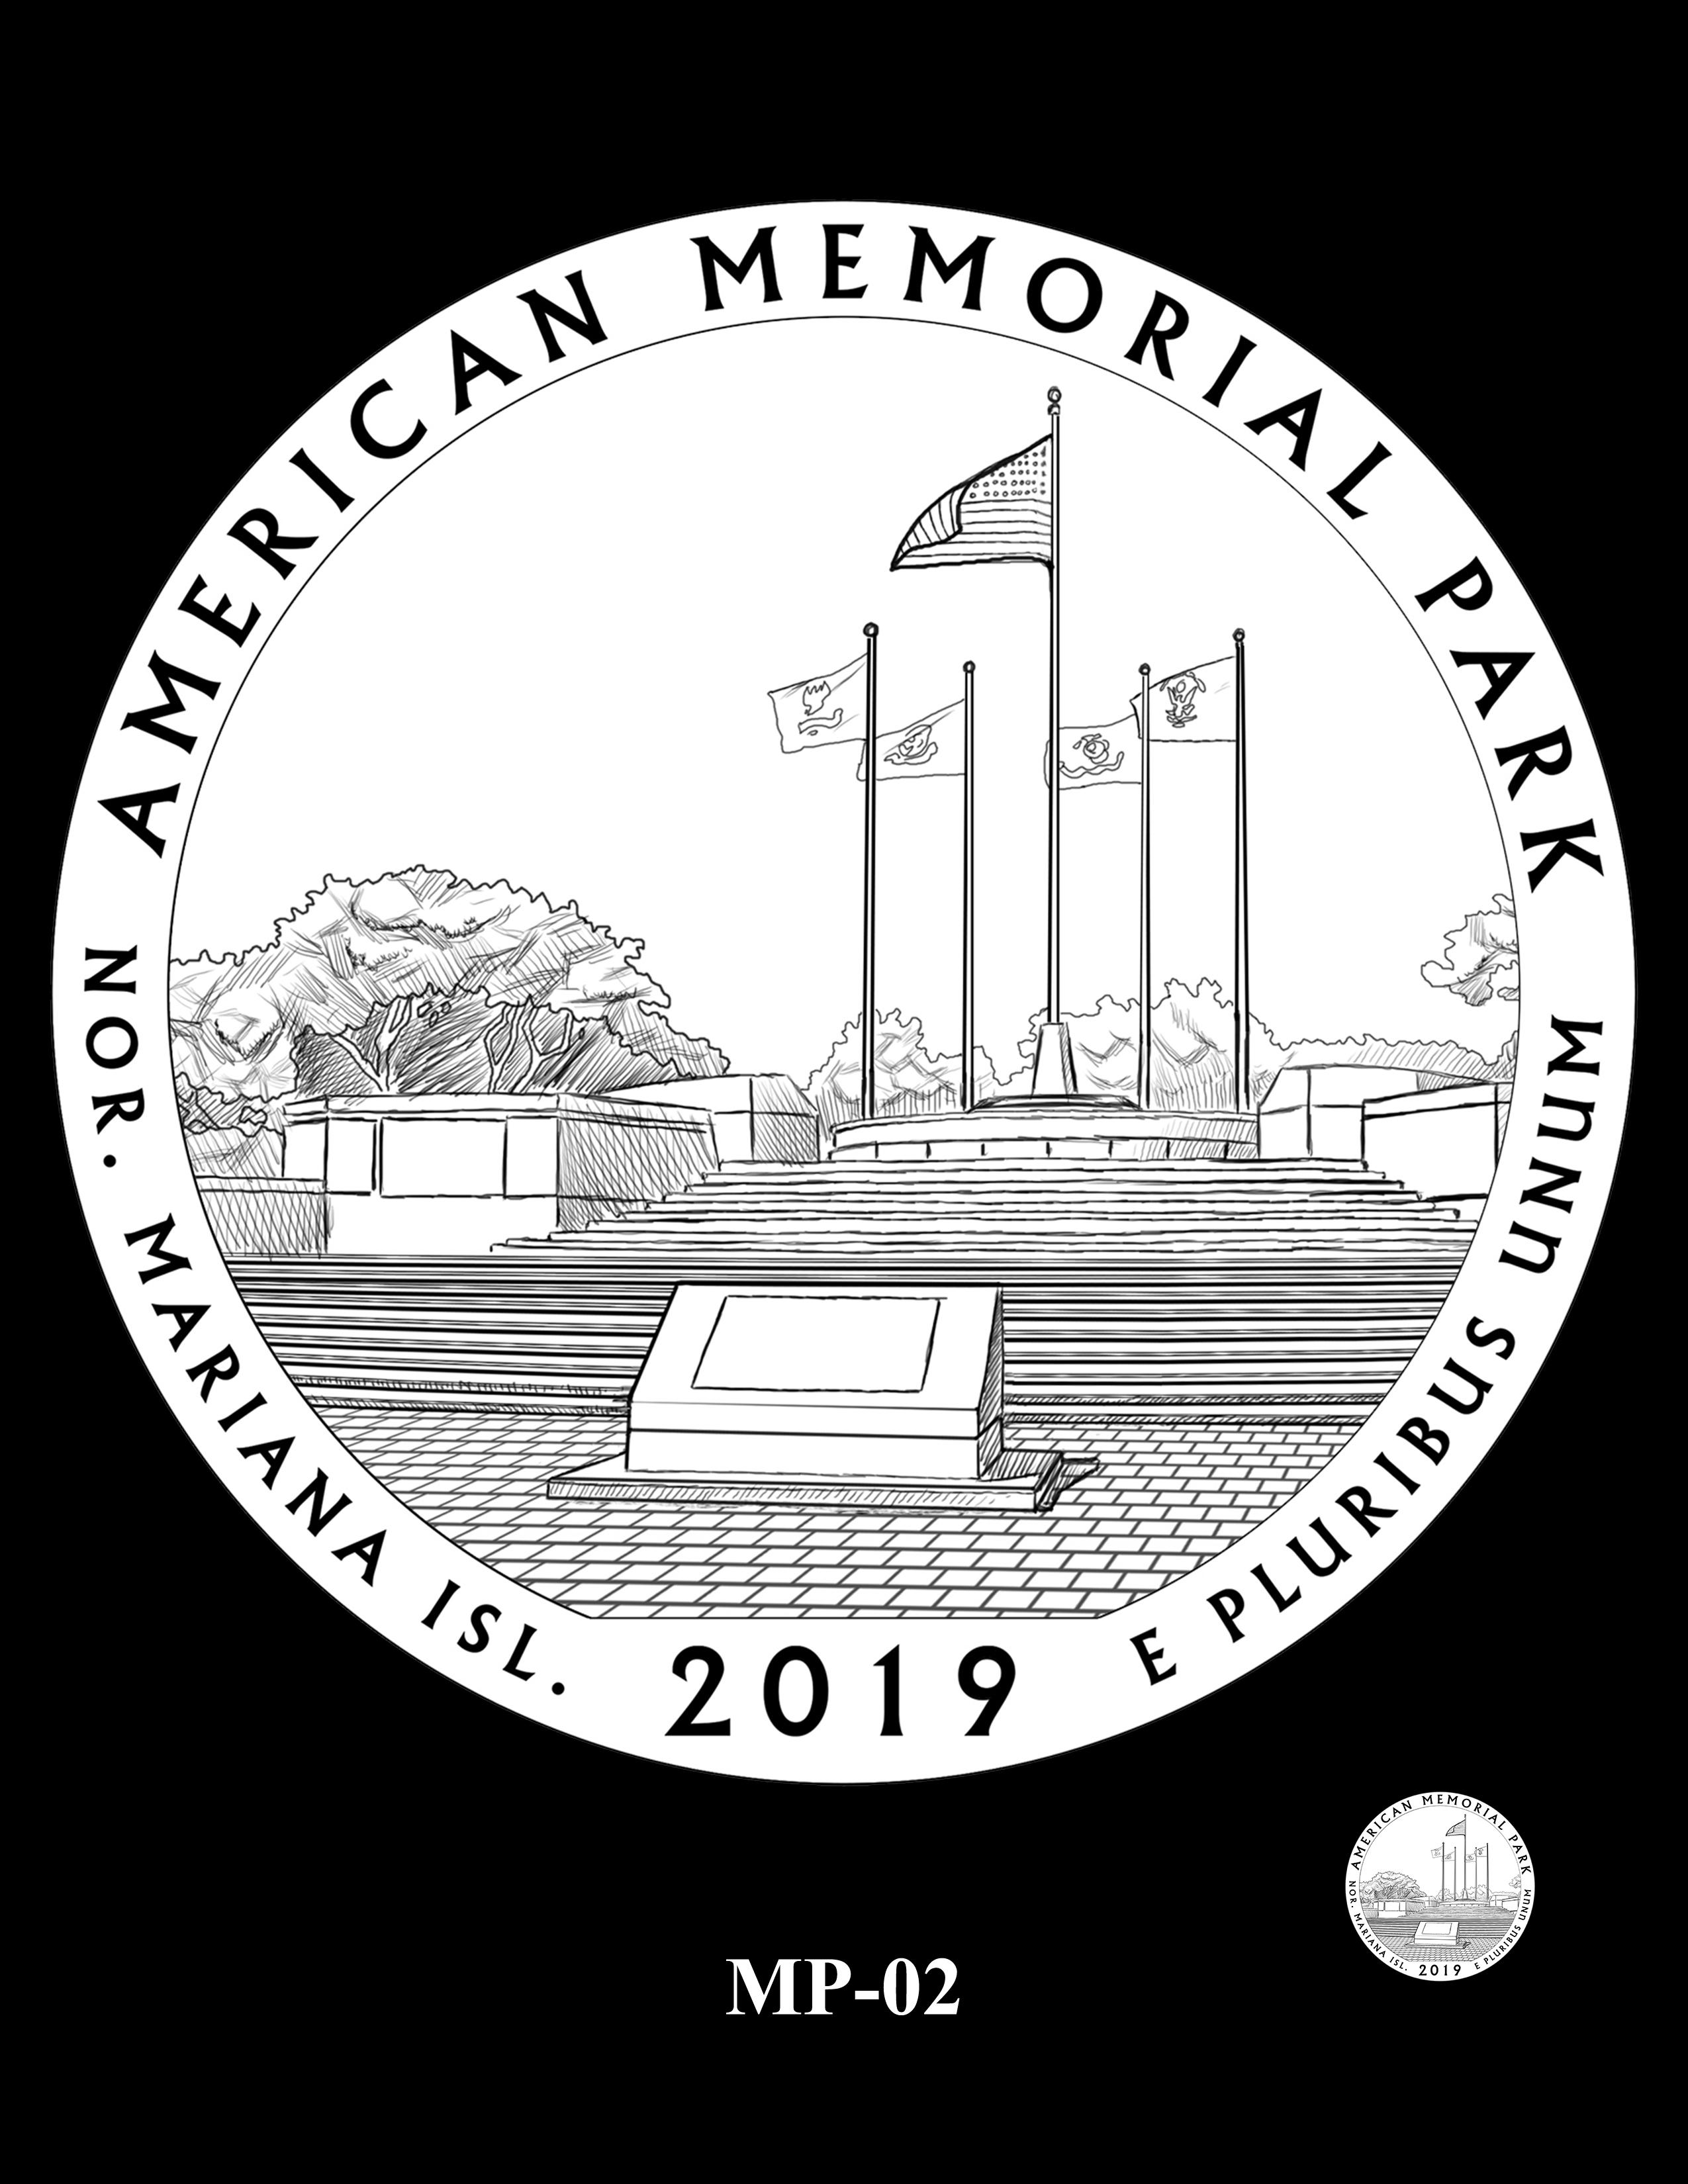 MP-02 -- 2019 America the Beautiful Quarters® Program